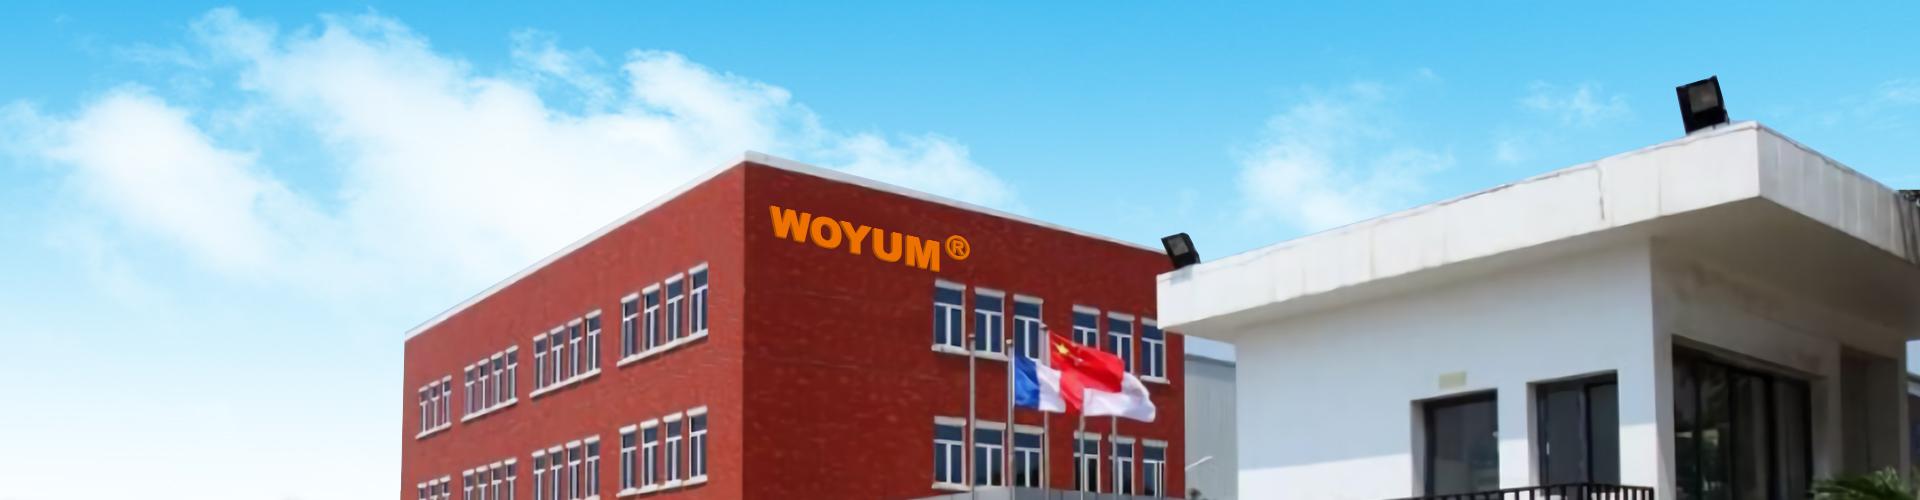 appliaction-Woyum-img